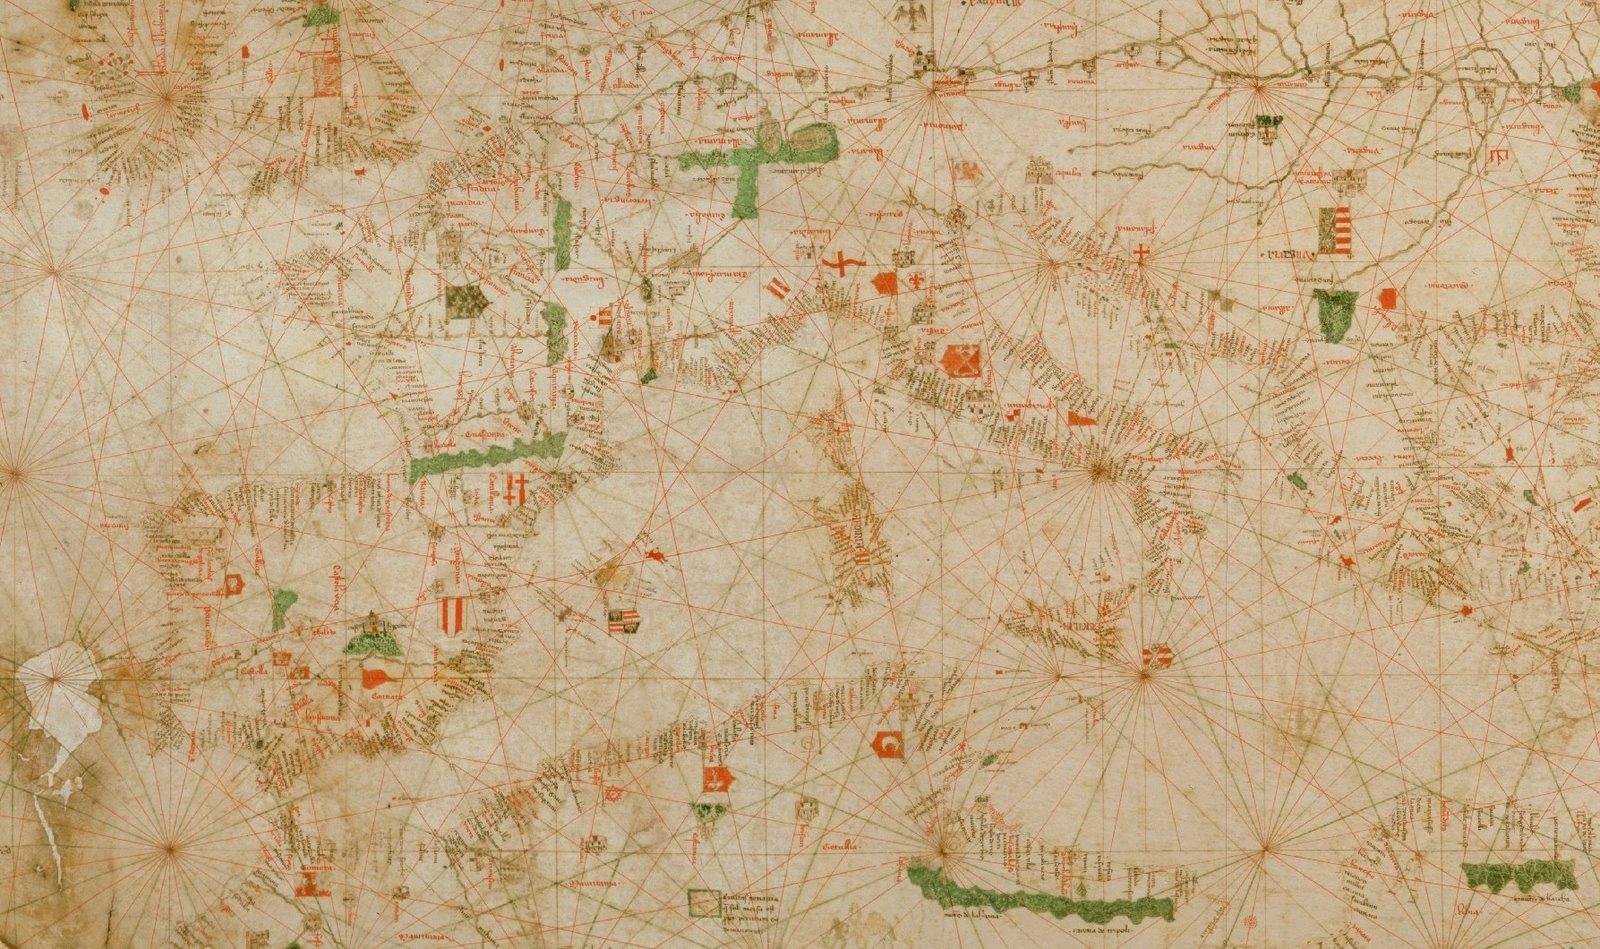 Файл:Dalorto 1325 map (partial).jpg